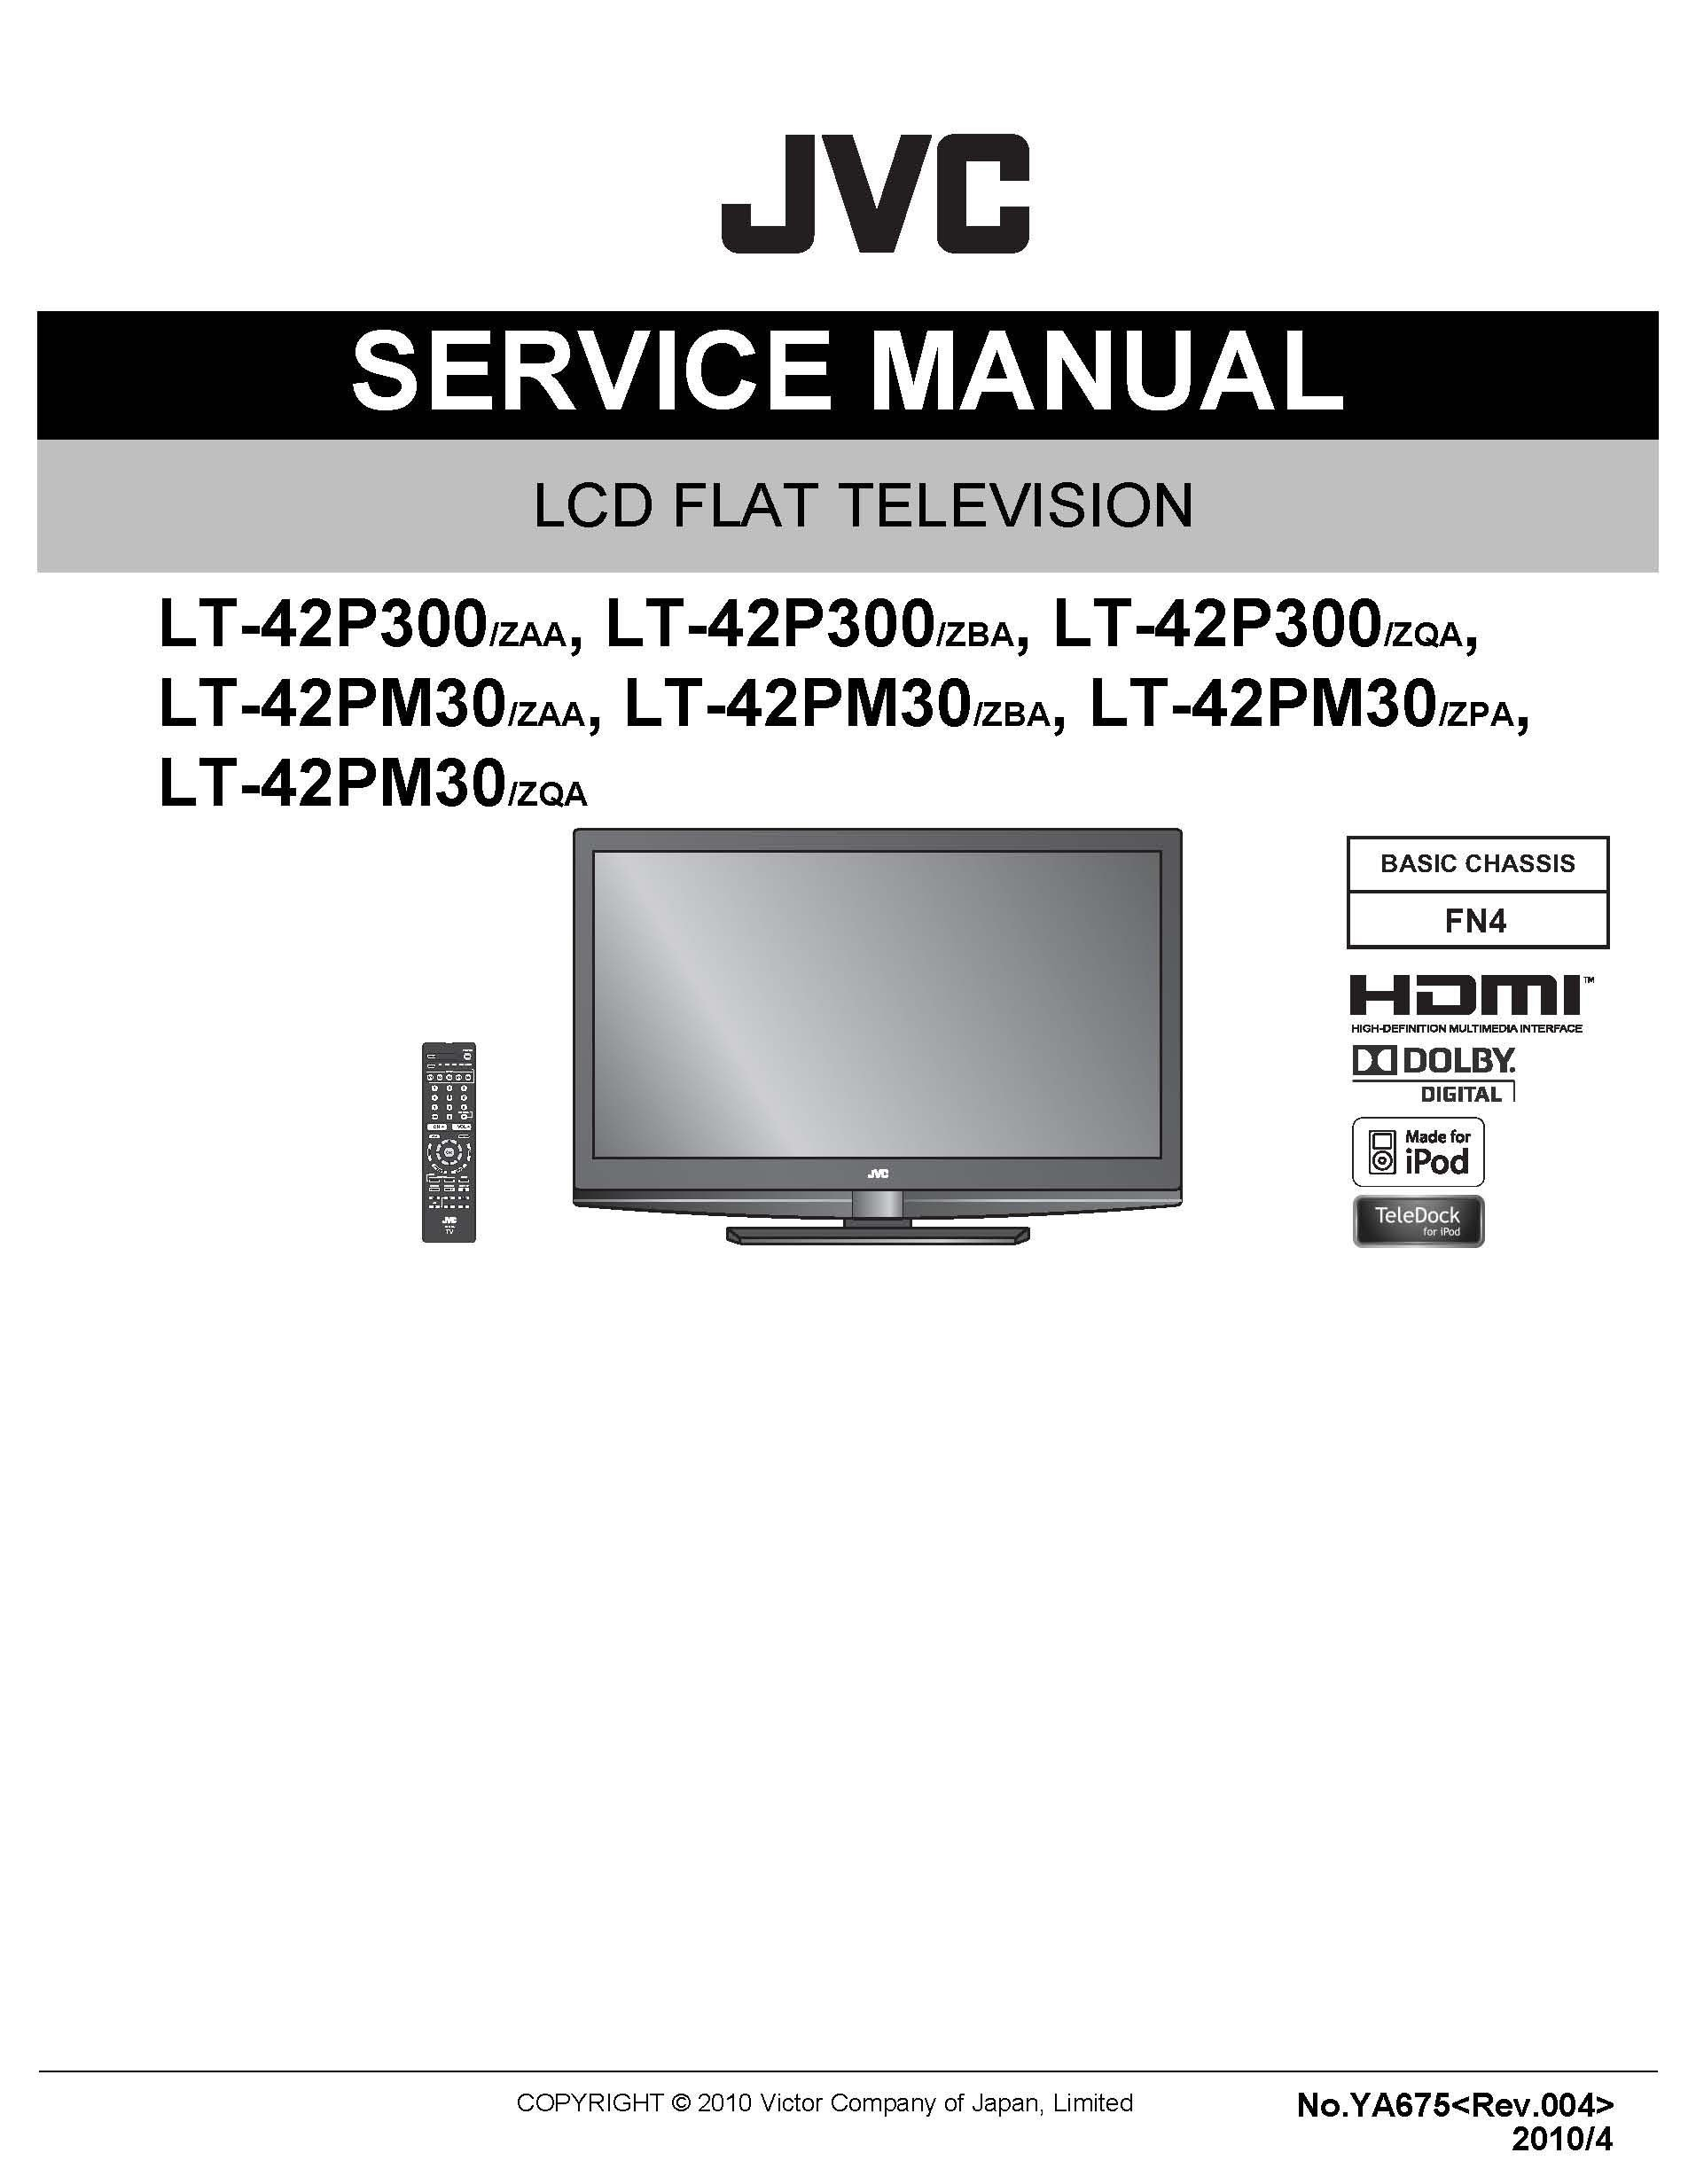 jvc lt 42pm30 service manual jvc amazon com books rh amazon com Service Manuals Service Manuals